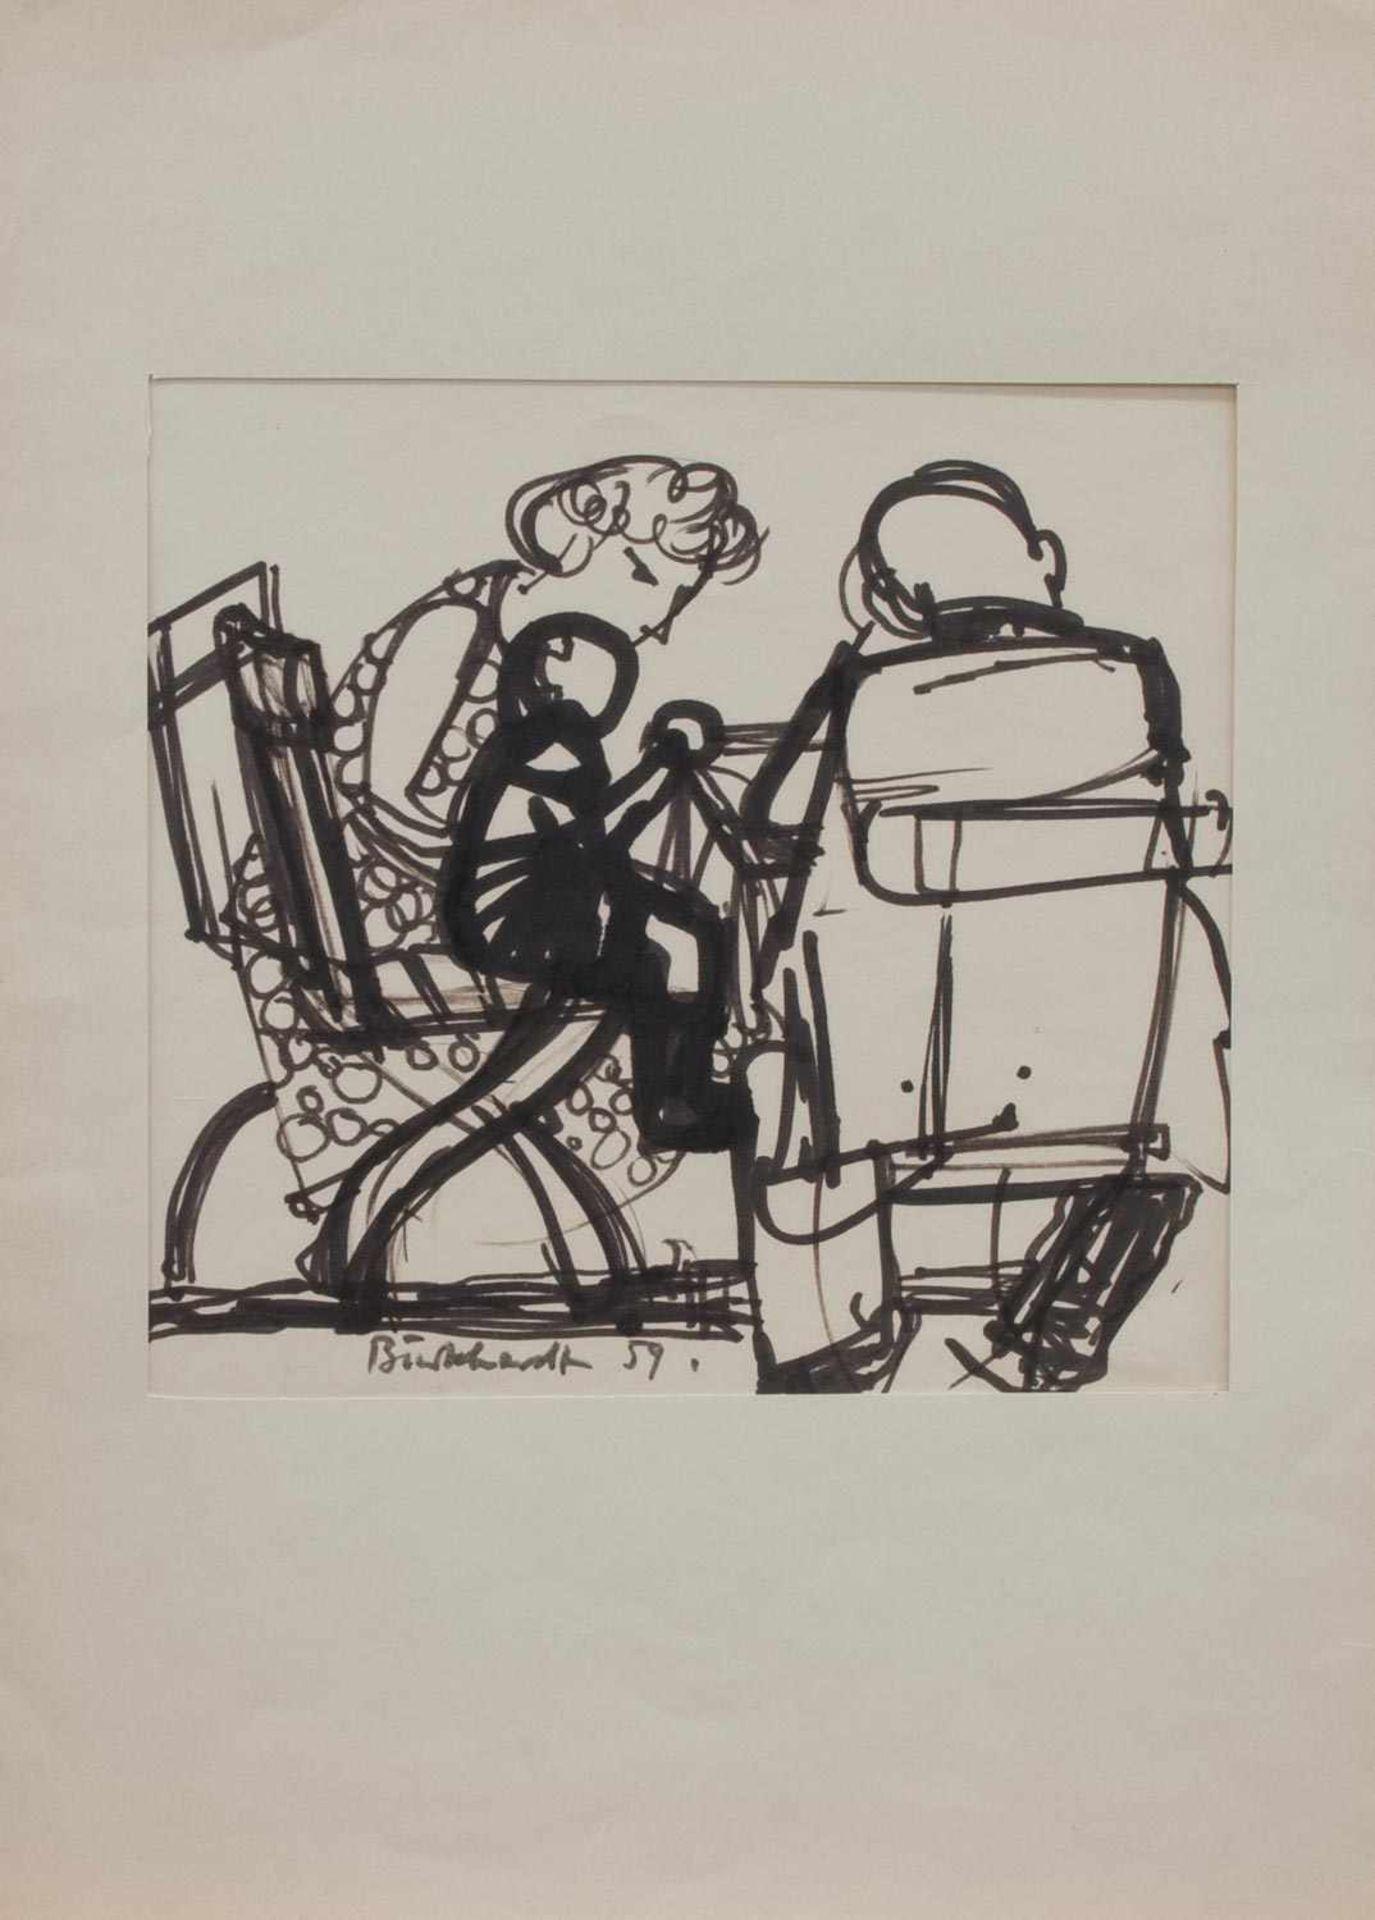 Heinrich Burkhardt (Altenburg 1904 - 1985 Berlin, deutscher Maler u. Grafiker, Std. a.d.